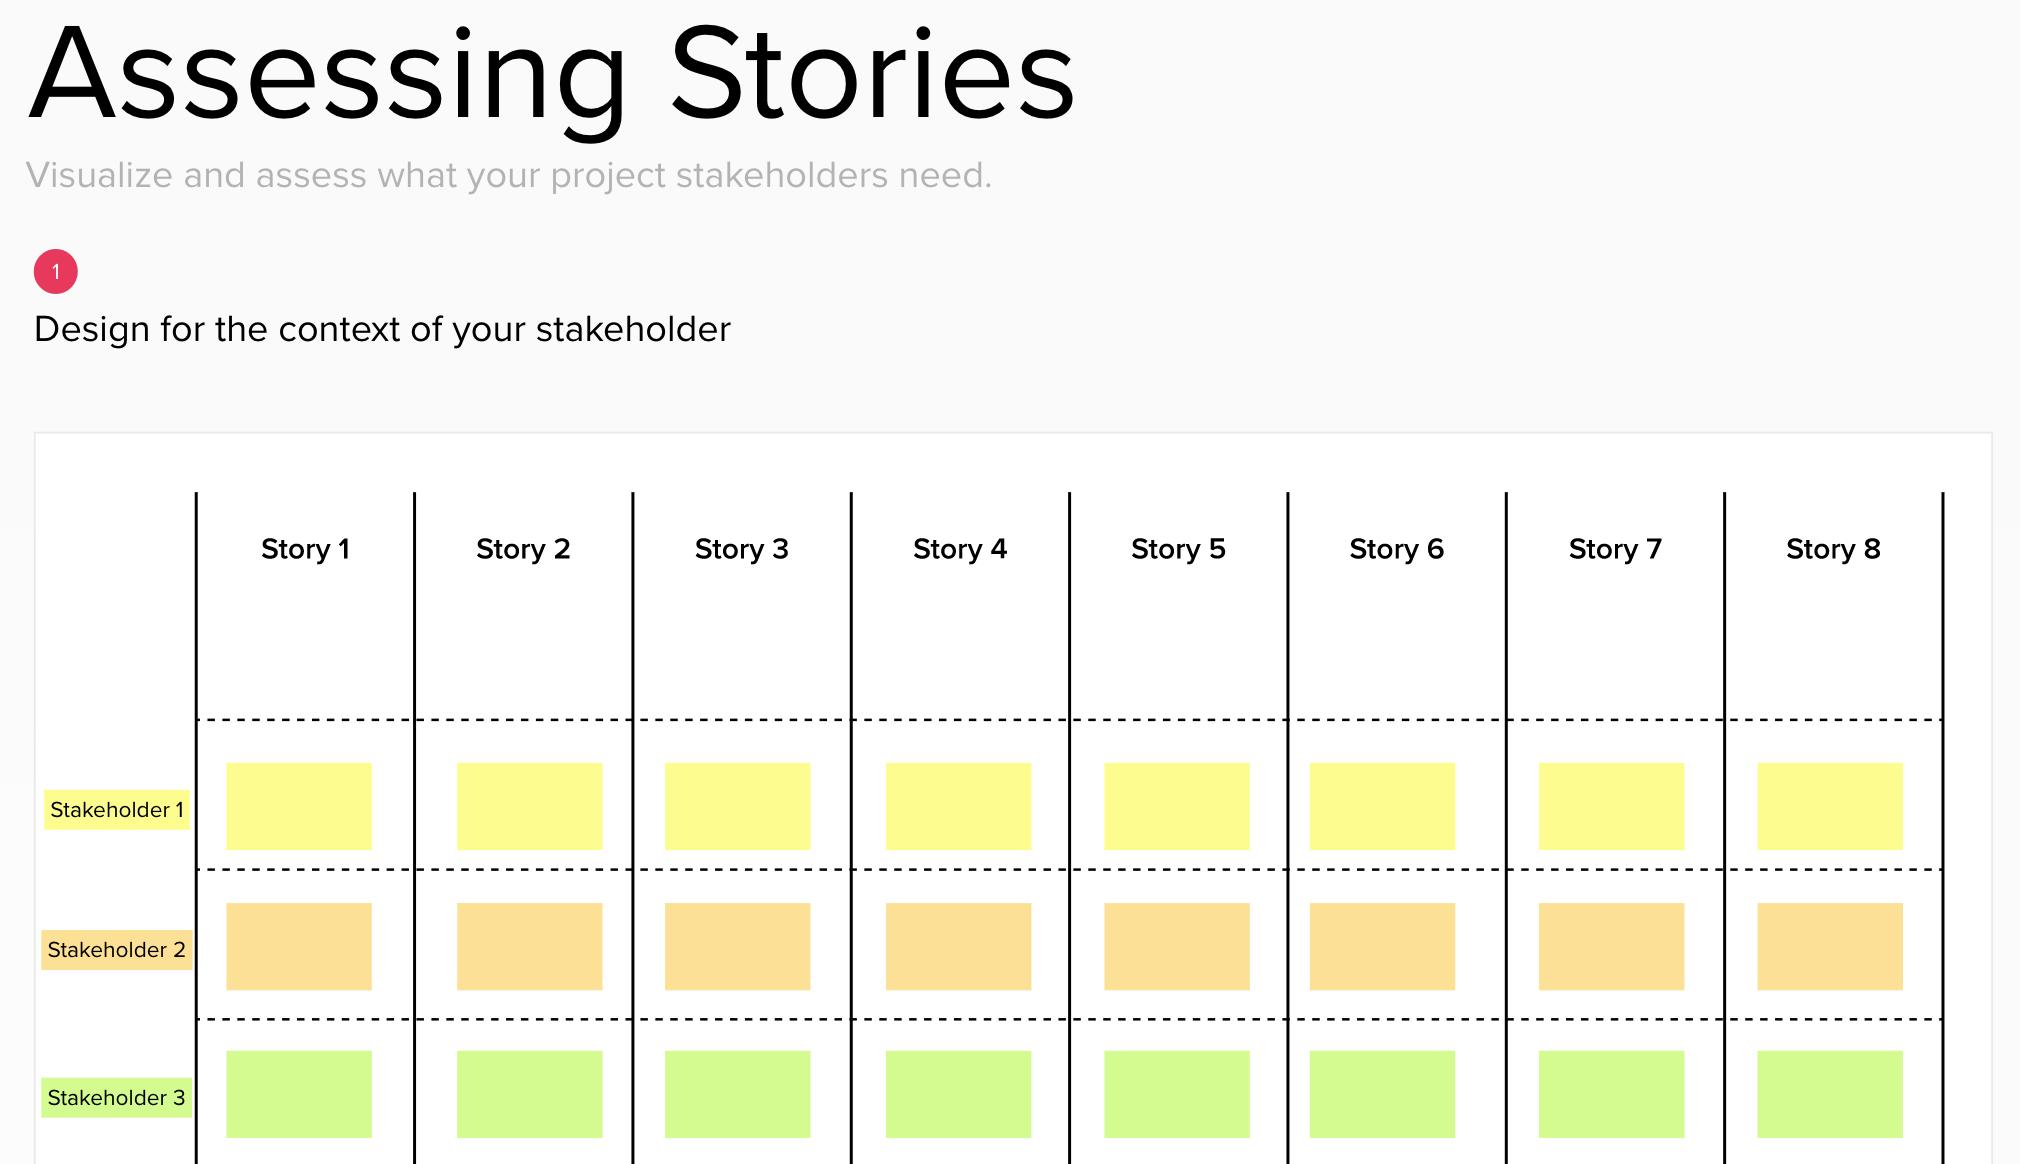 Assessing Stories